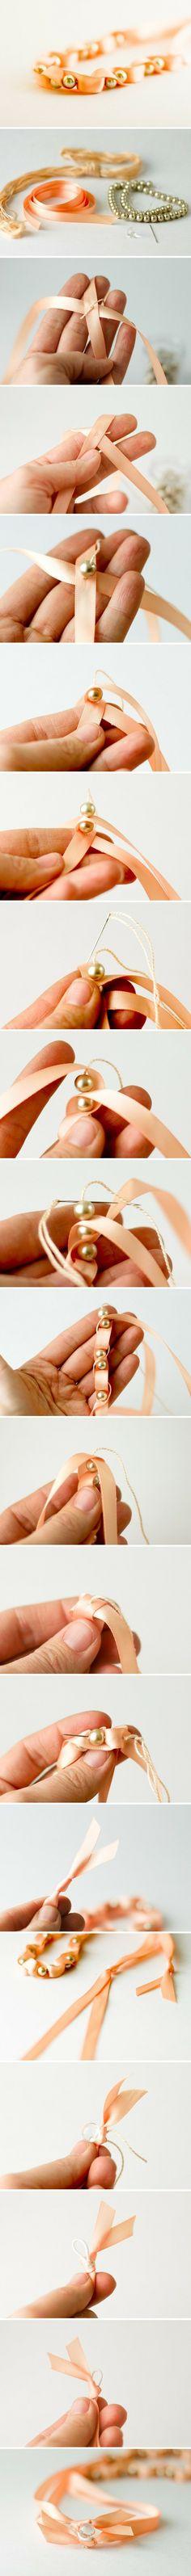 Easy & elegant bracelet with pearls #DIY #Crafts